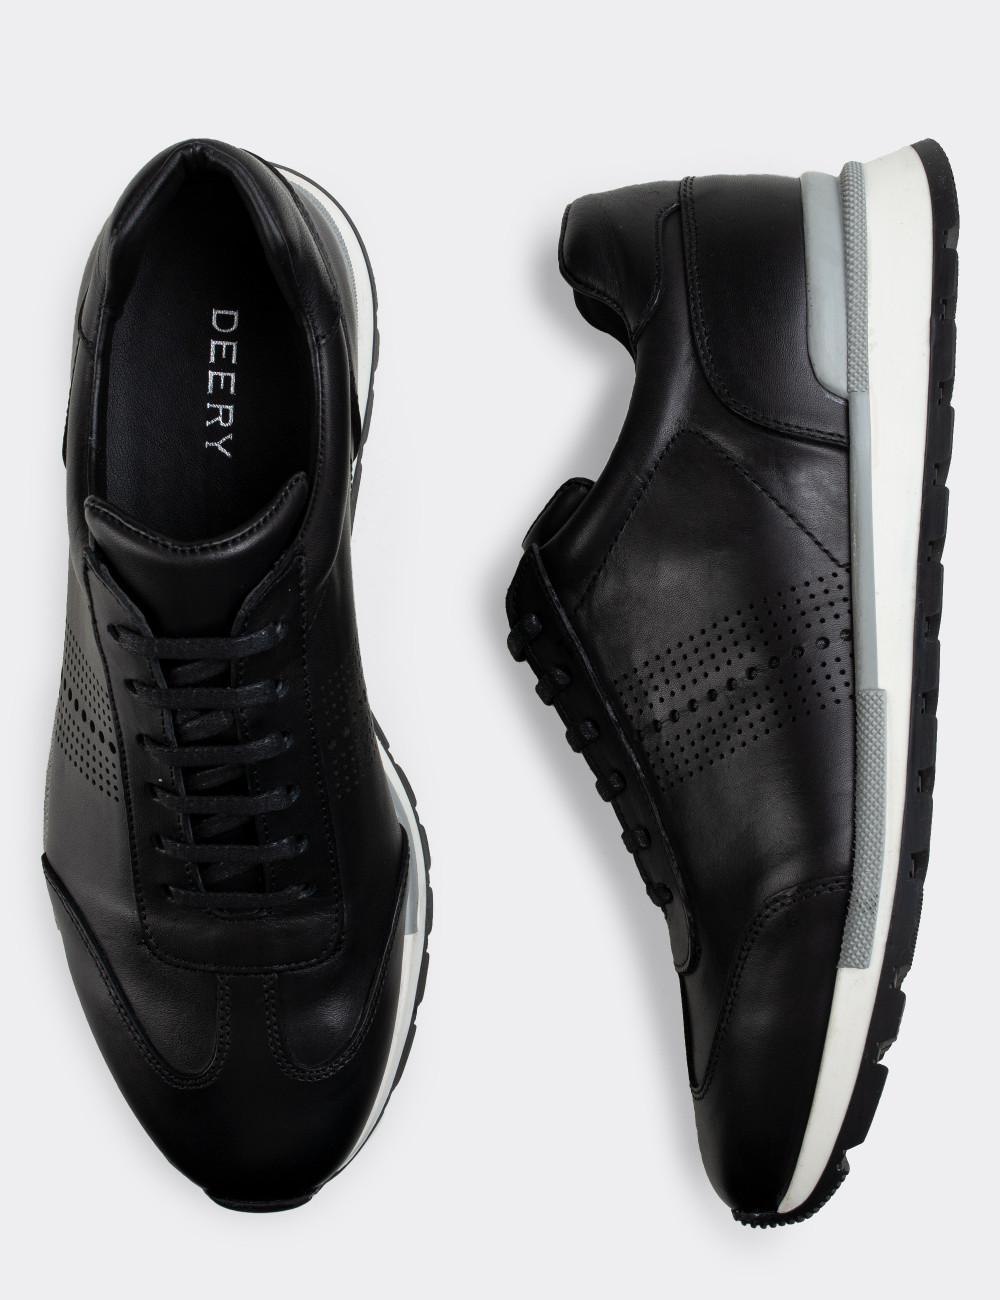 Hakiki Deri Siyah Erkek Sneaker Ayakkabı - 01738MSYHT02